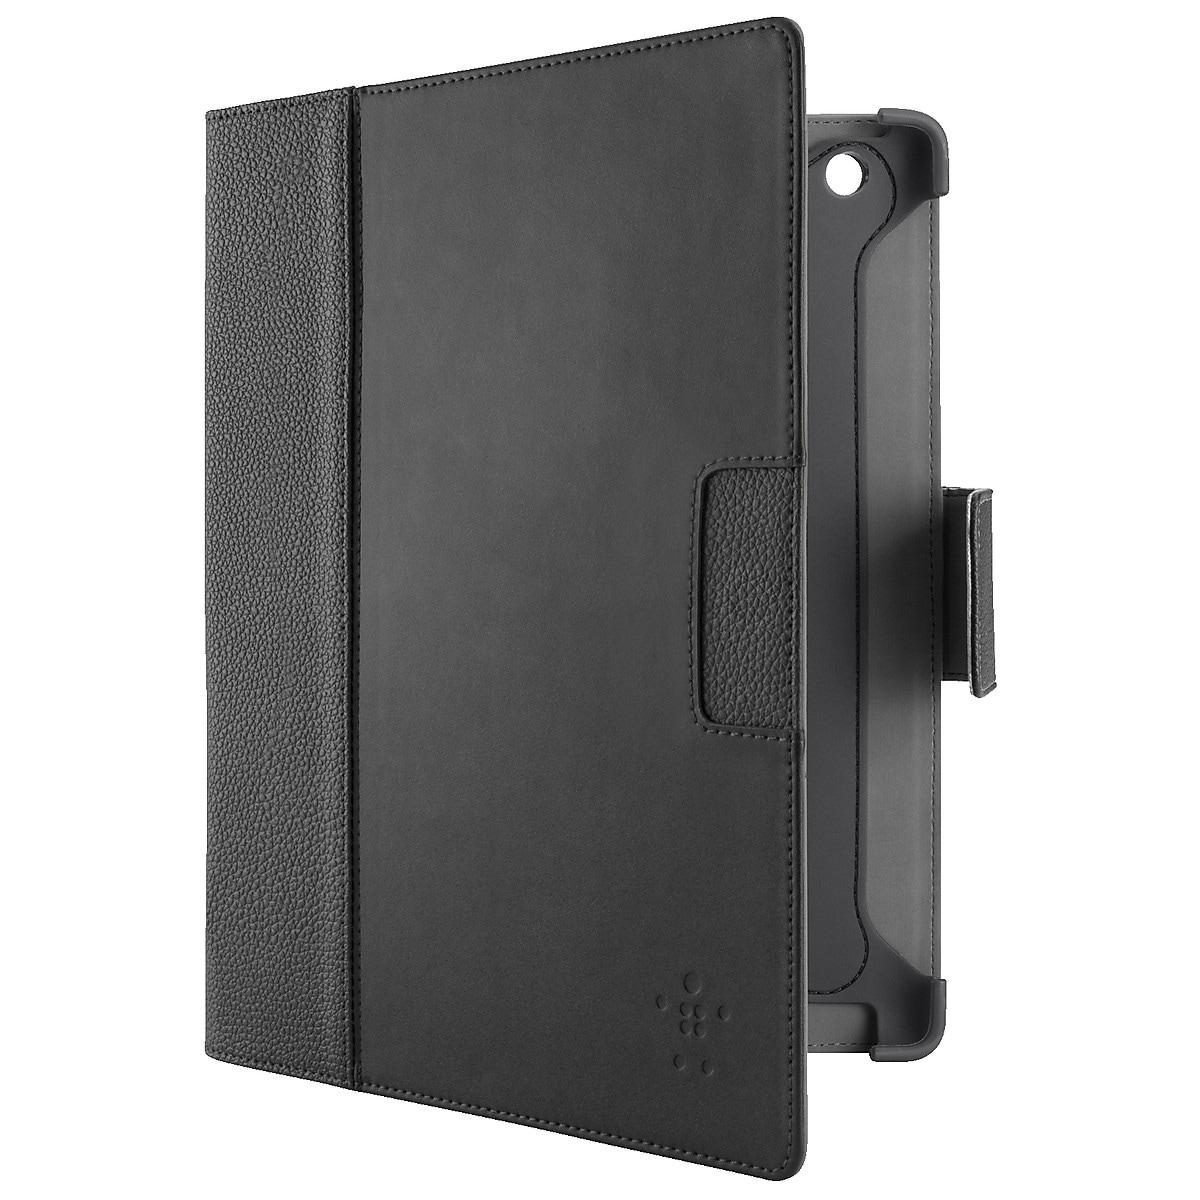 Belkin futteral for iPad Cinema Leather Folio